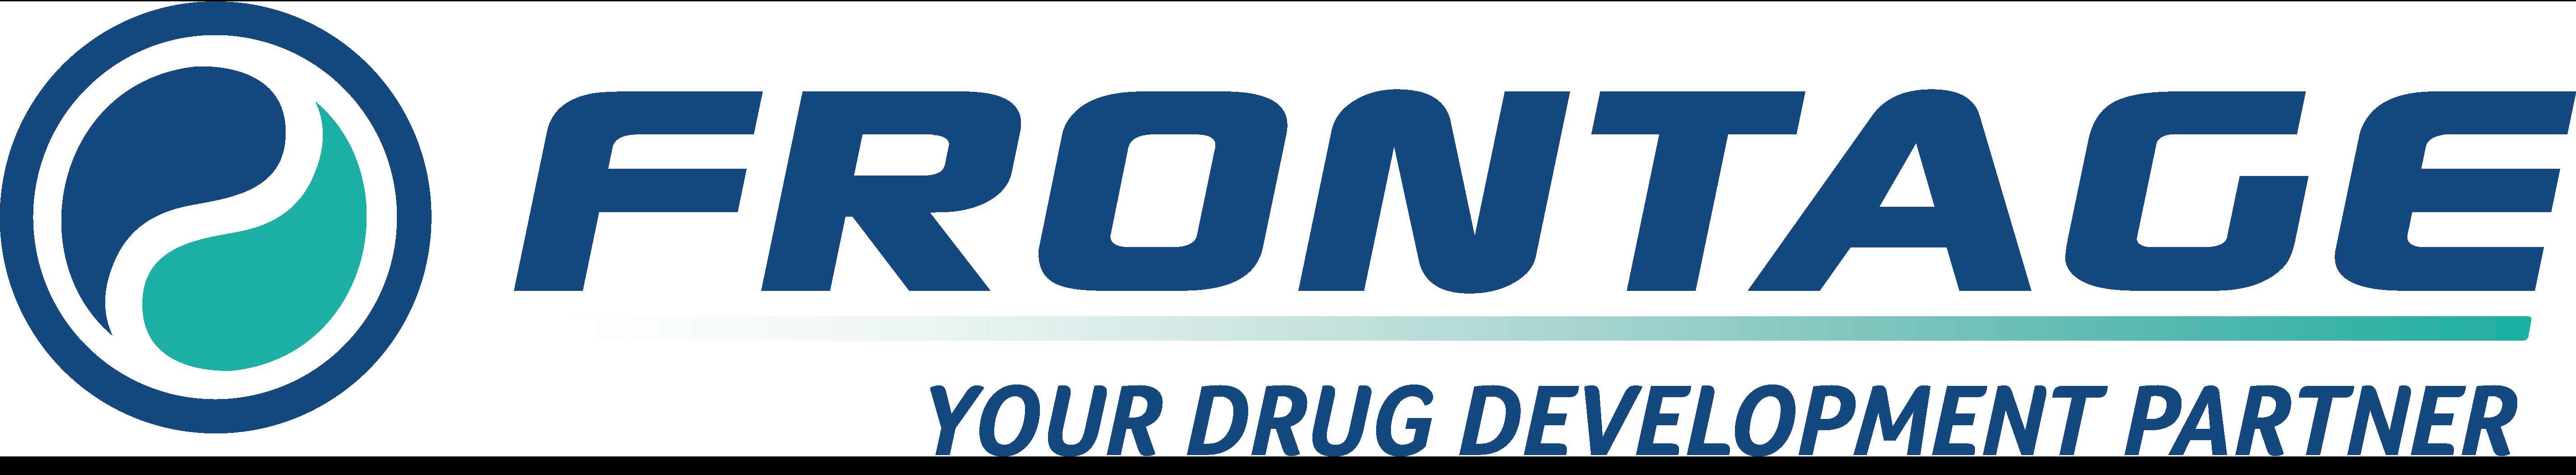 Frontage Laboratories, Inc